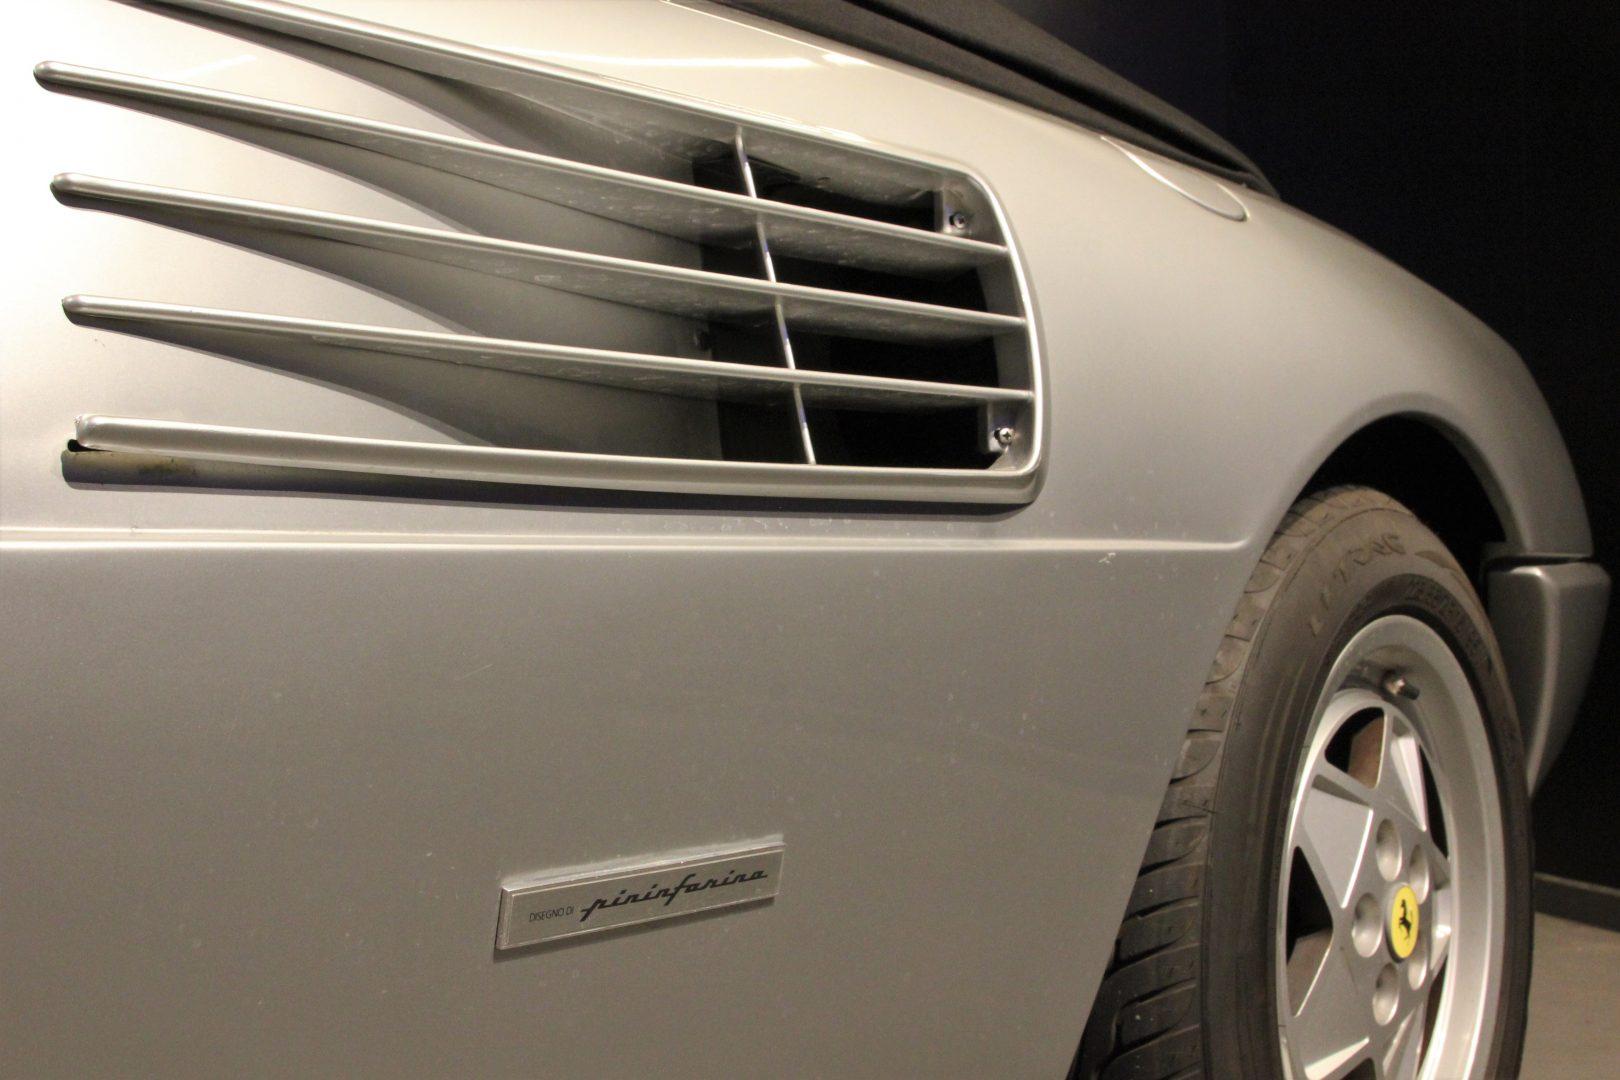 AIL Ferrari Mondial T Cabriolet 3,4 V8 8